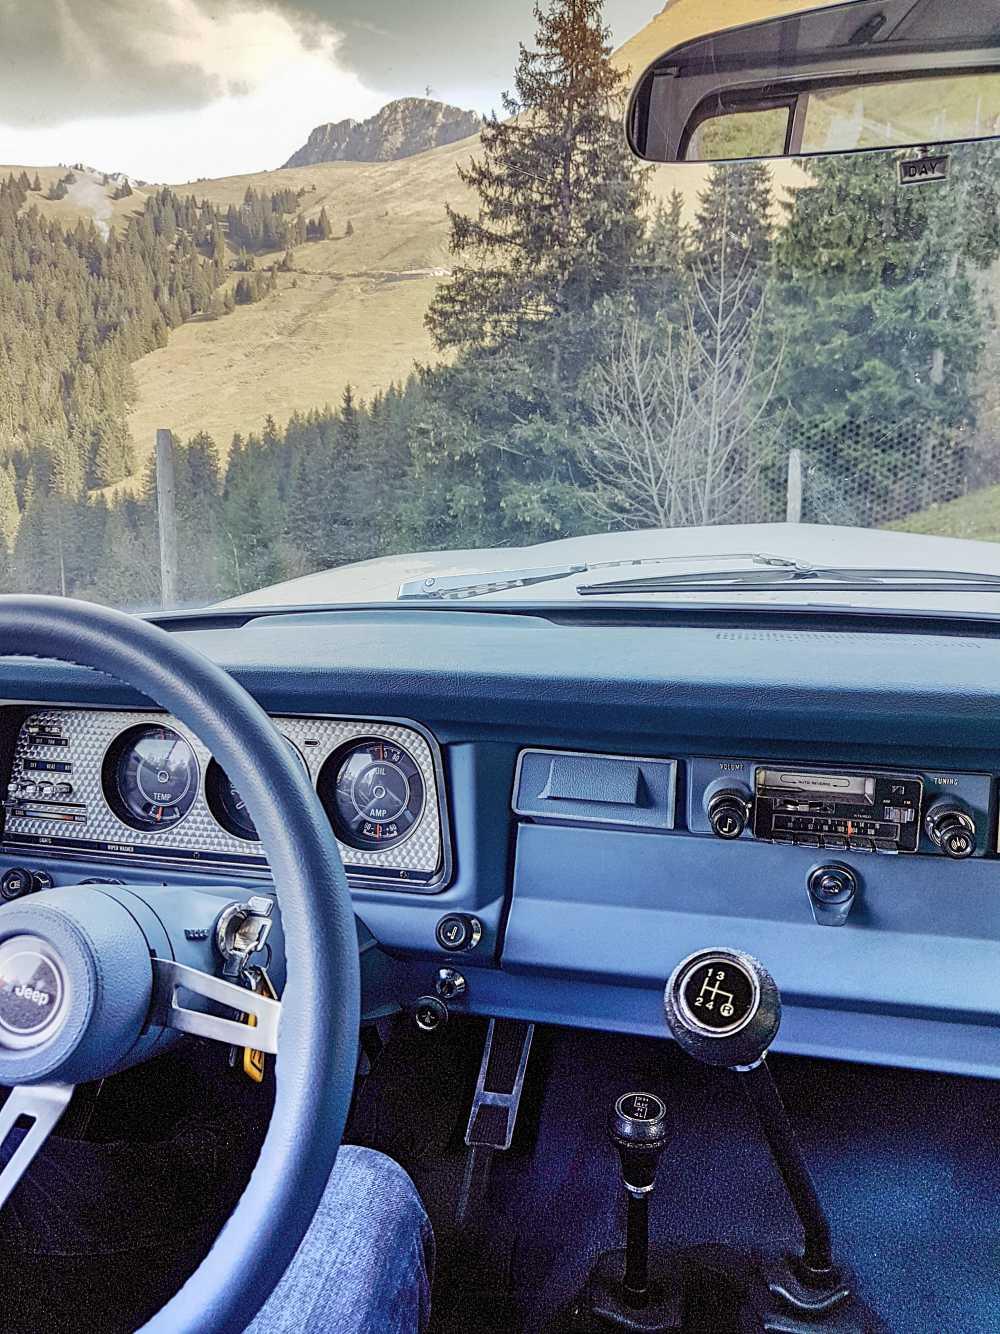 jeep-cherokee-chief-1978-shooting-moleson-8